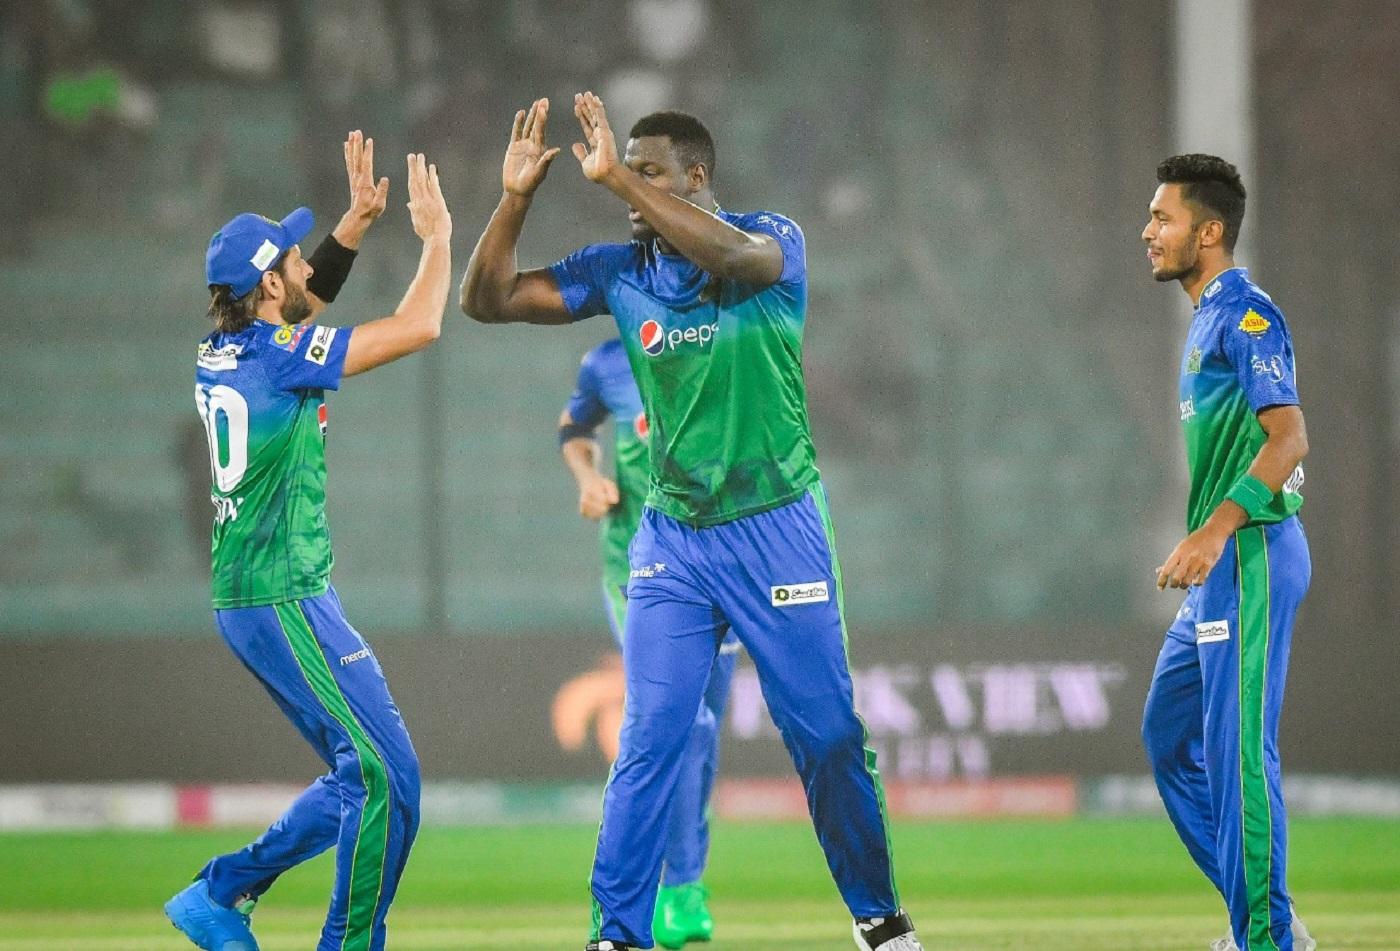 Shahid Afridi, Carlos Brathwaite and Mohammad Umar celebrate a wicket,  Islamabad United vs Multan Sultans, PSL 2021, Karachi, February 21, 2021